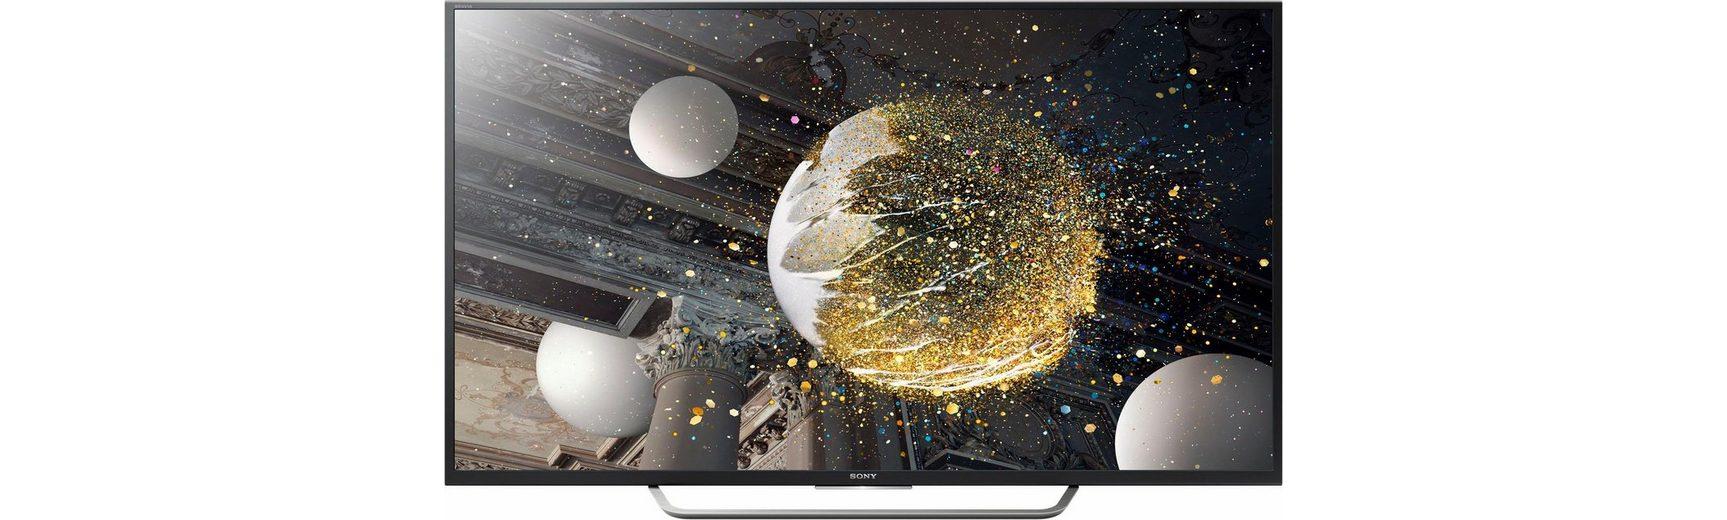 Sony KD-65XD7505, LED Fernseher, 164 cm (65 Zoll), 2160p (4K Ultra HD), HDR, Smart-TV